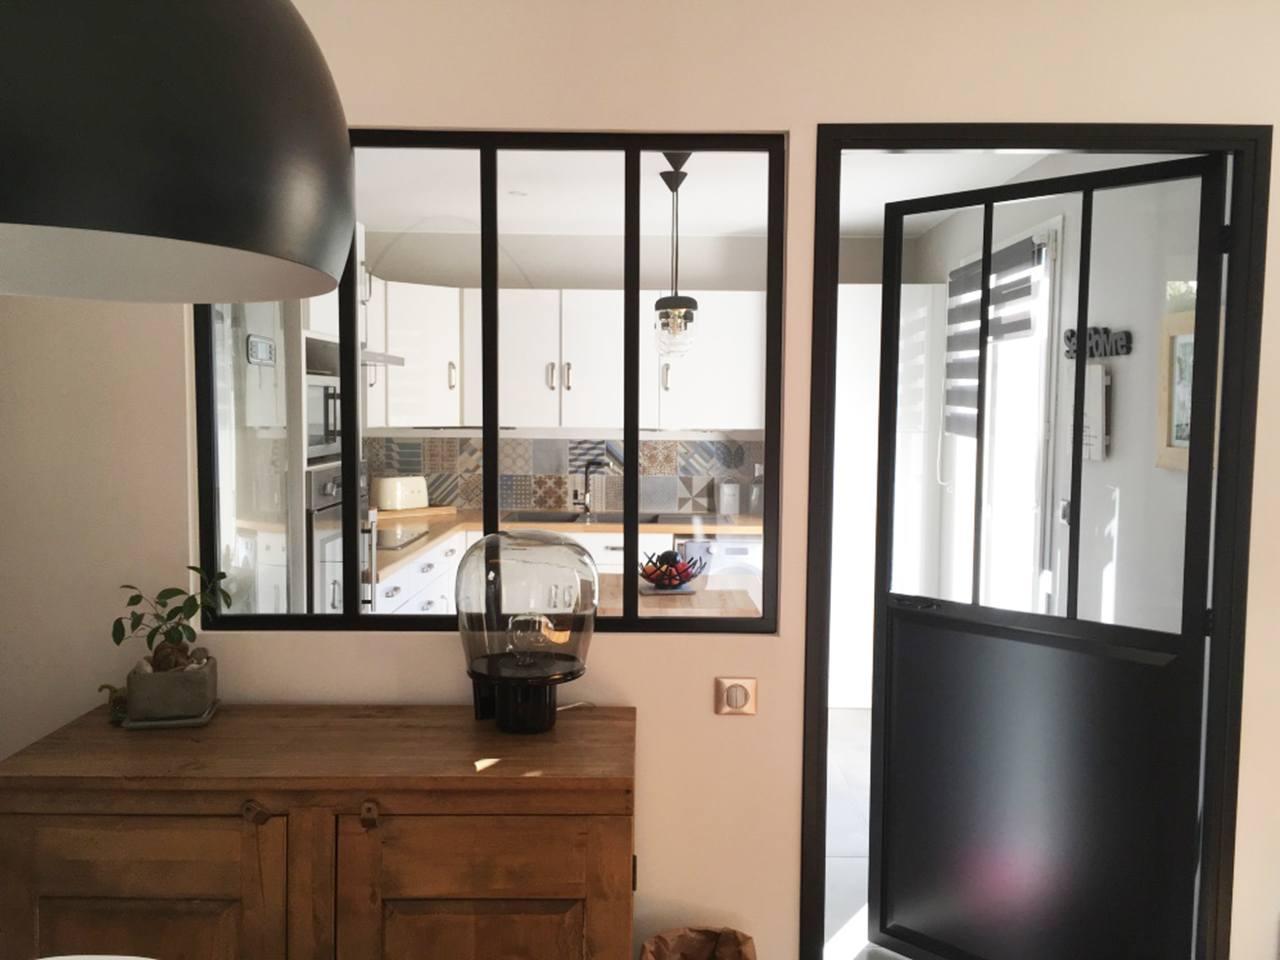 Verri re atelier cuisine p gomas smaltdesign for Verriere entre cuisine et salle a manger